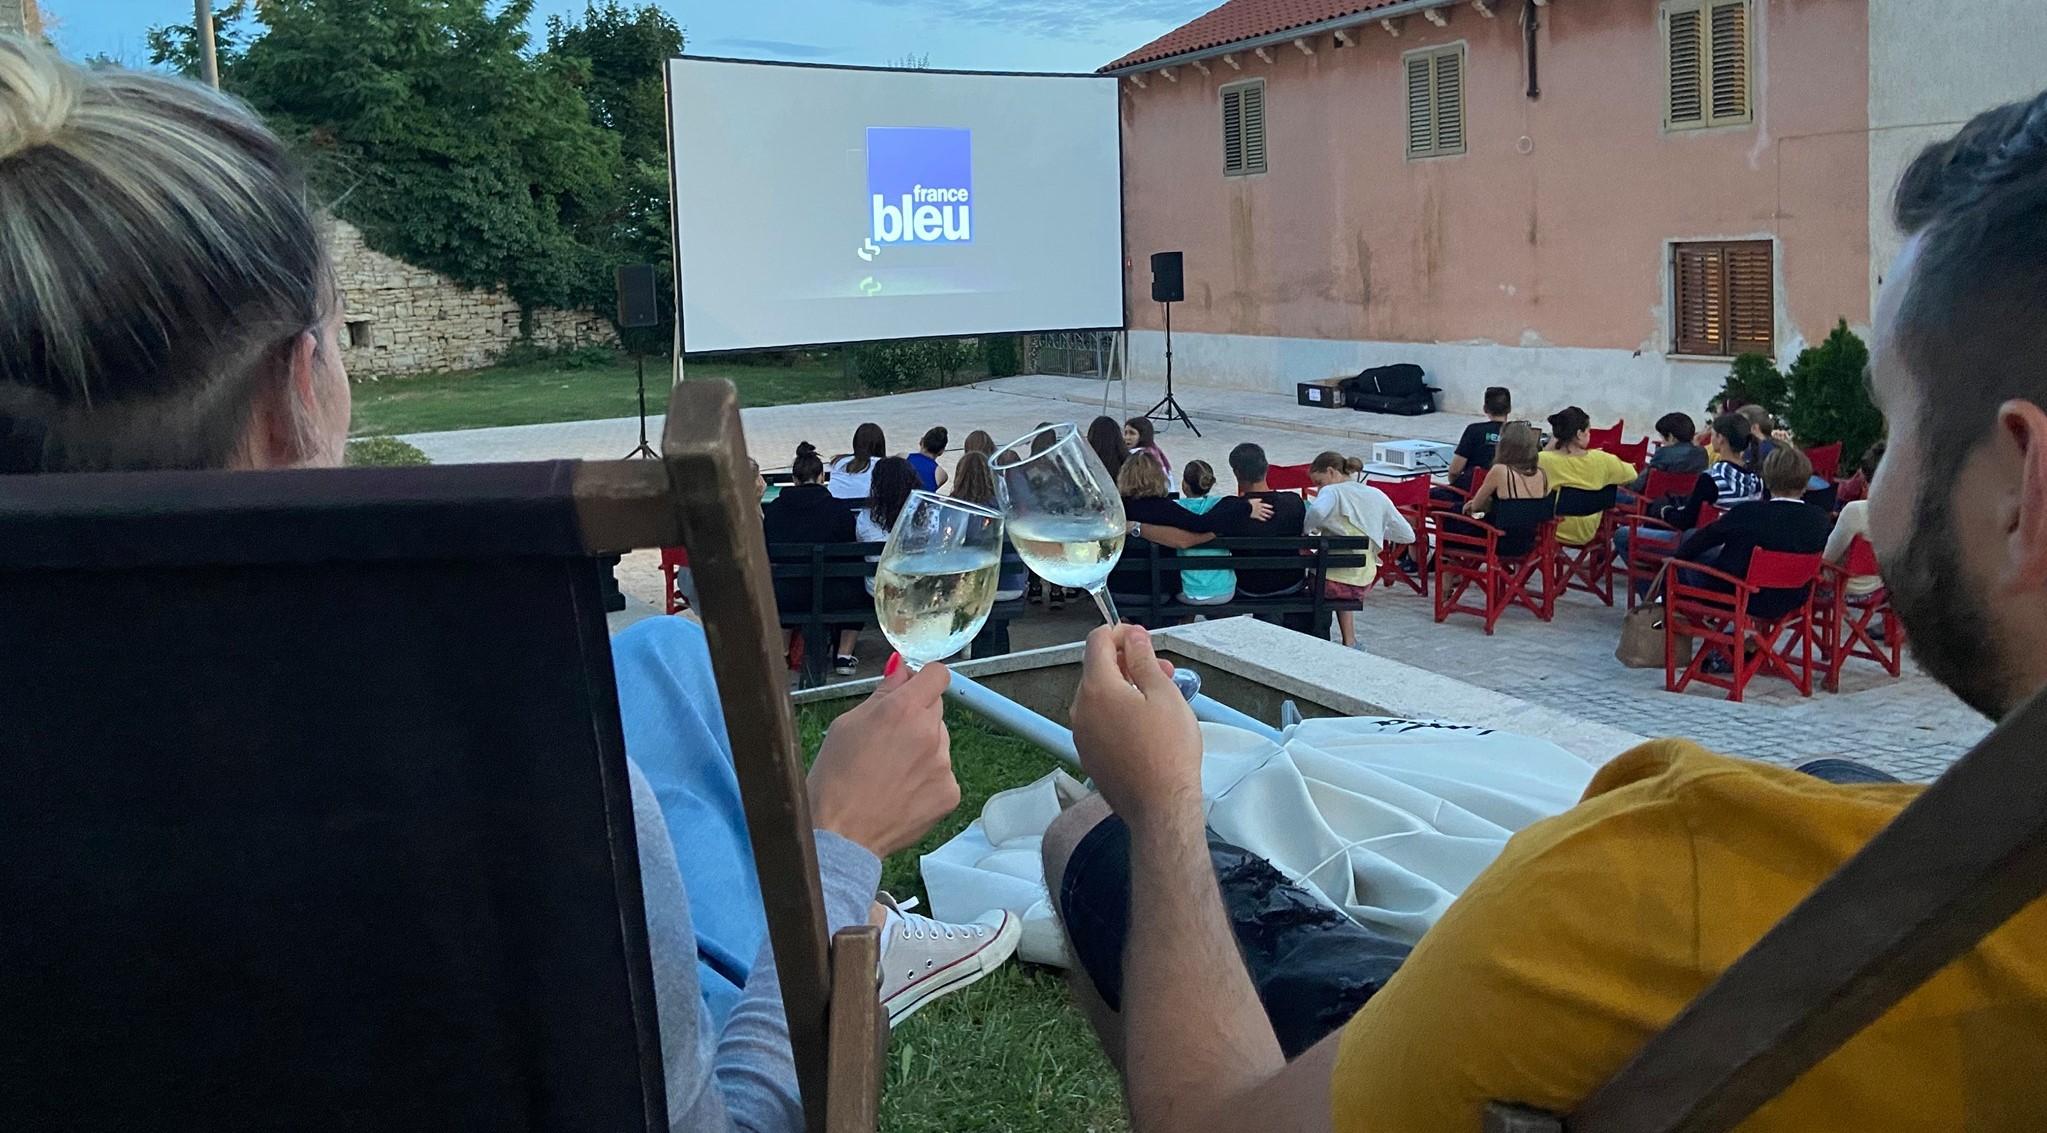 Ljetno kino u središnjoj Istri – preko 30 projekcija na 10 lokacija